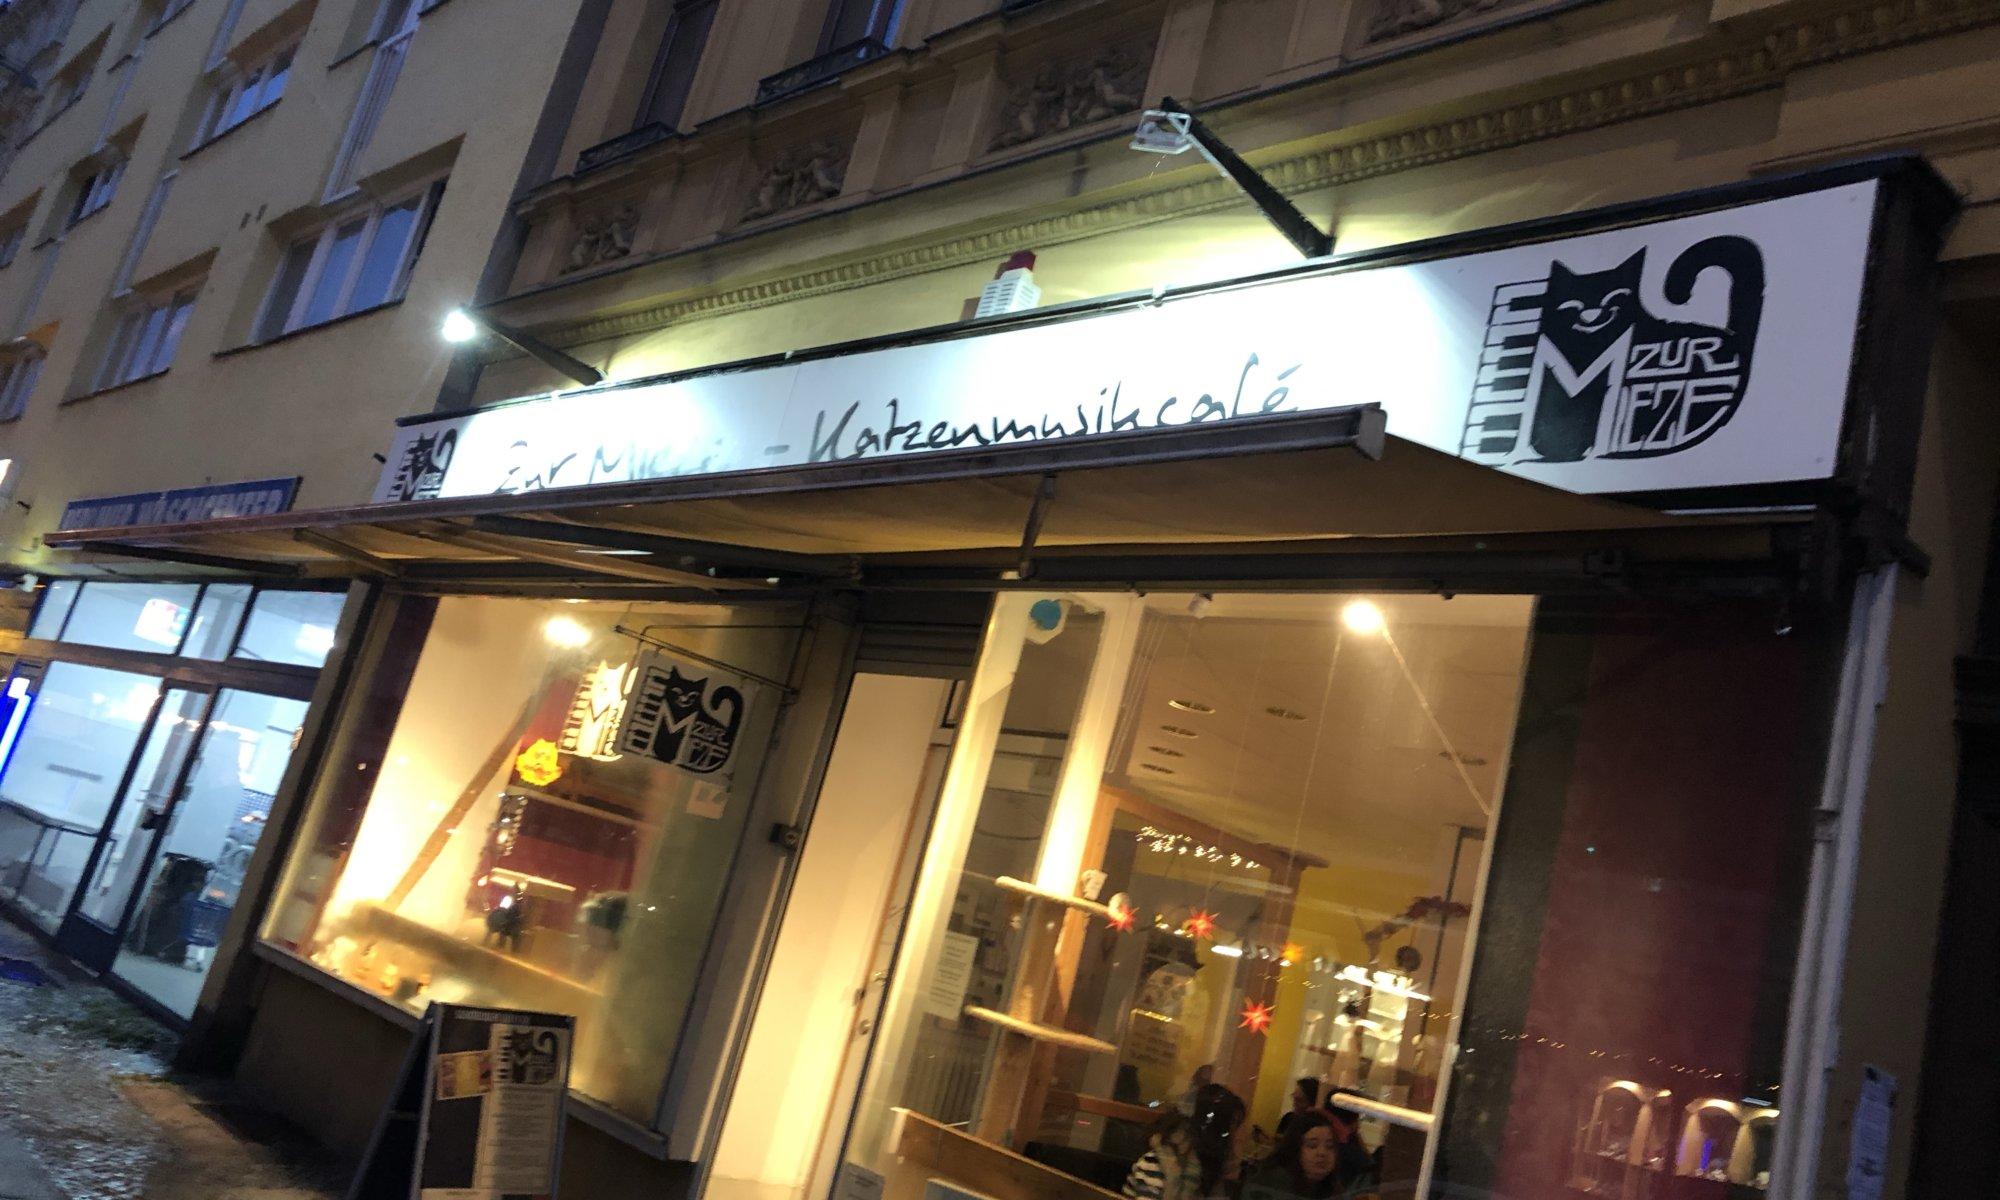 Katzenmusikcafe Zur Mieze, Berlin